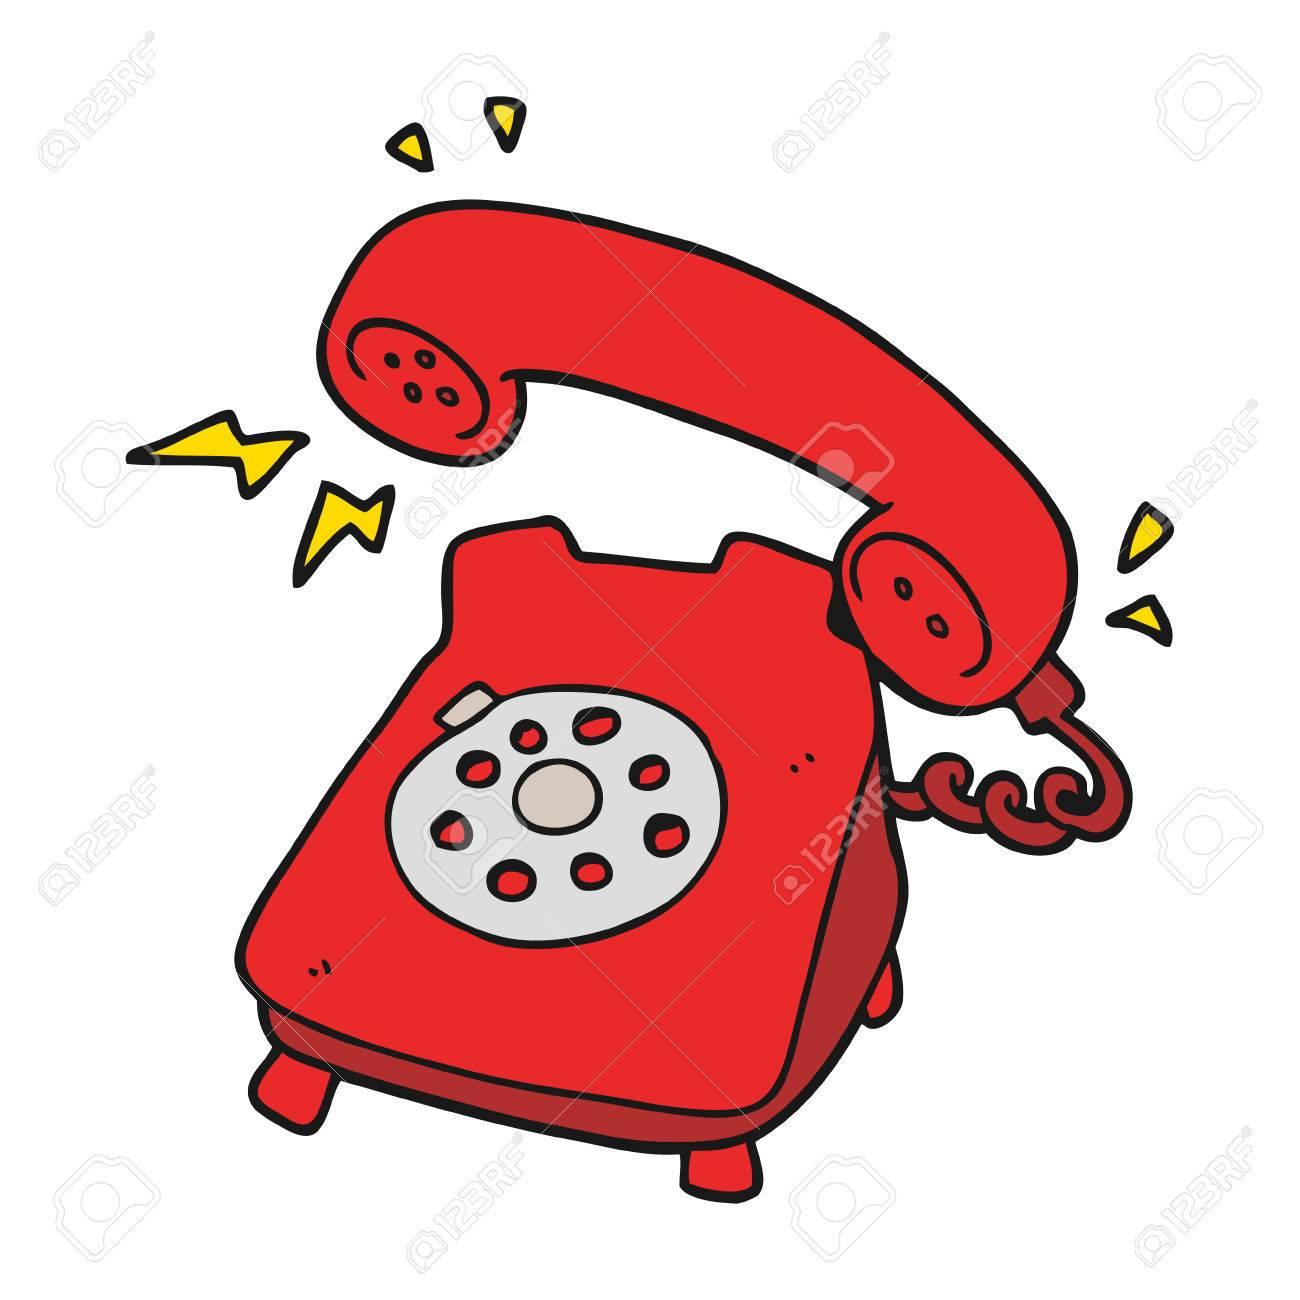 Clipart Phone Ringing.